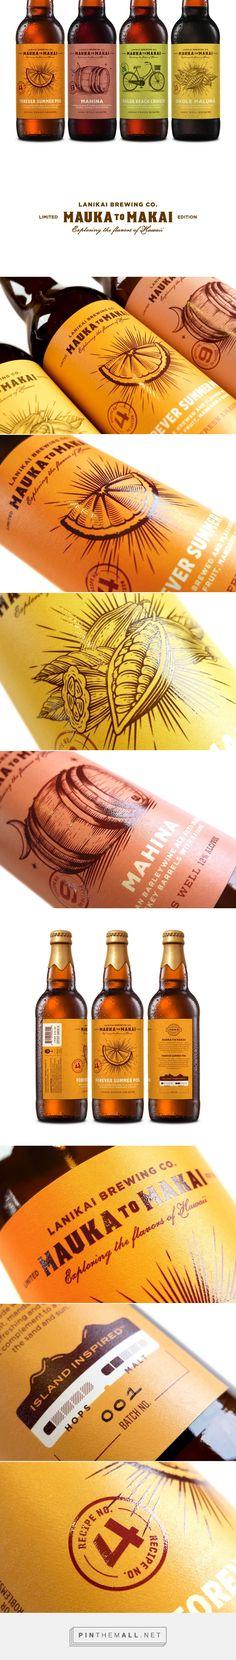 Lanikai Brewing Co: Mauka to Makai - Packaging of the World - Creative Package Design Gallery - http://www.packagingoftheworld.com/2017/01/kincsem-kastely-winery.html